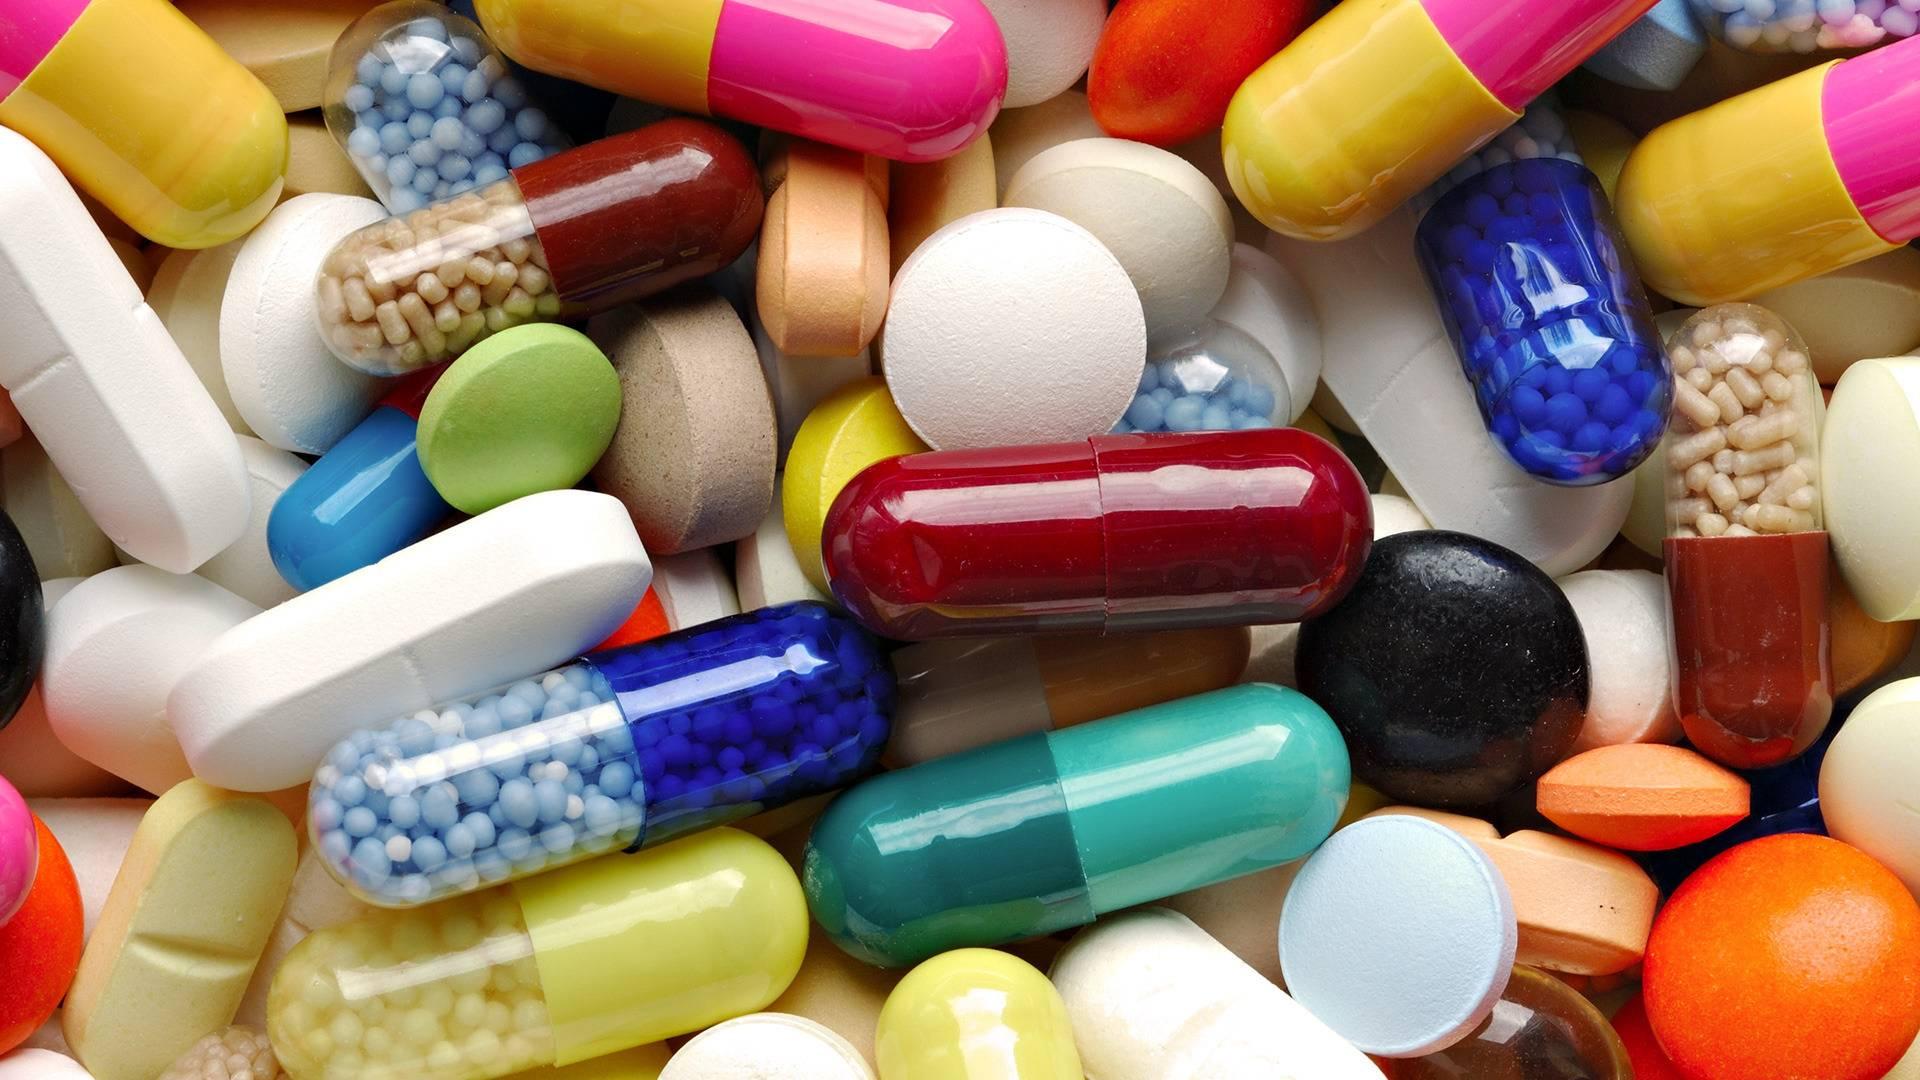 pharmaceutical-industry-sales-BG20131217135948.jpg